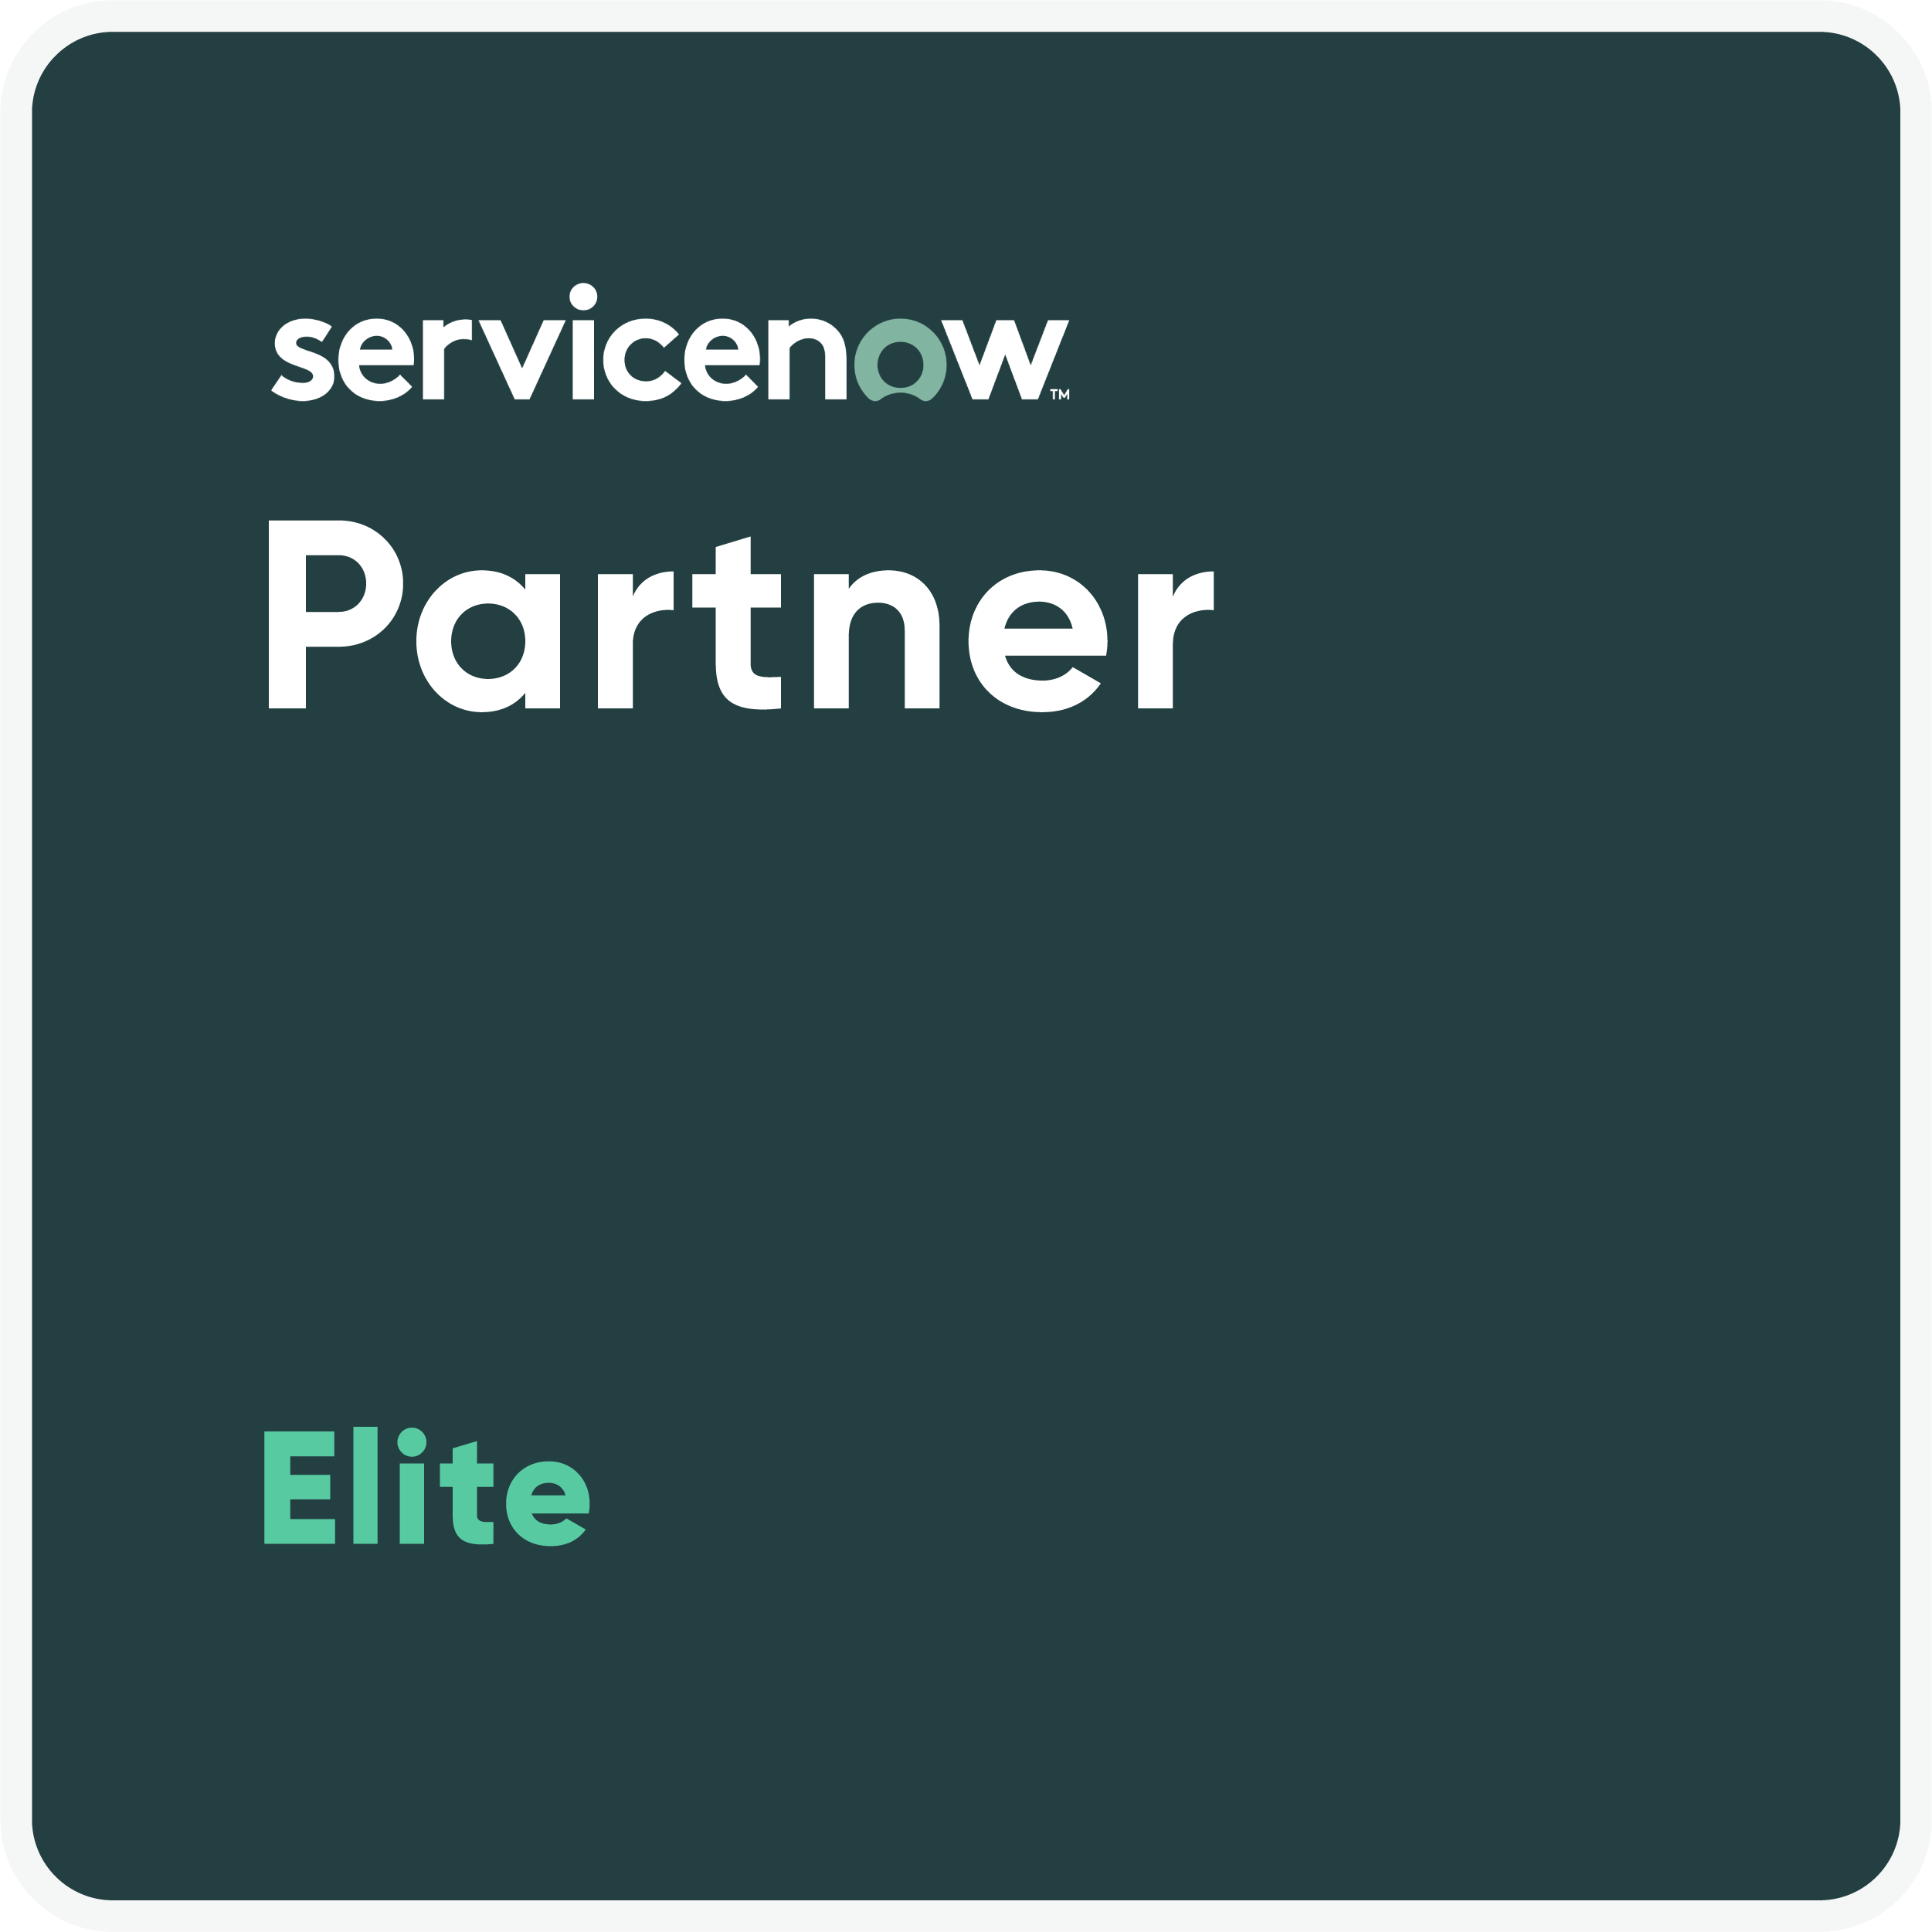 ServiceNow Partner Elite